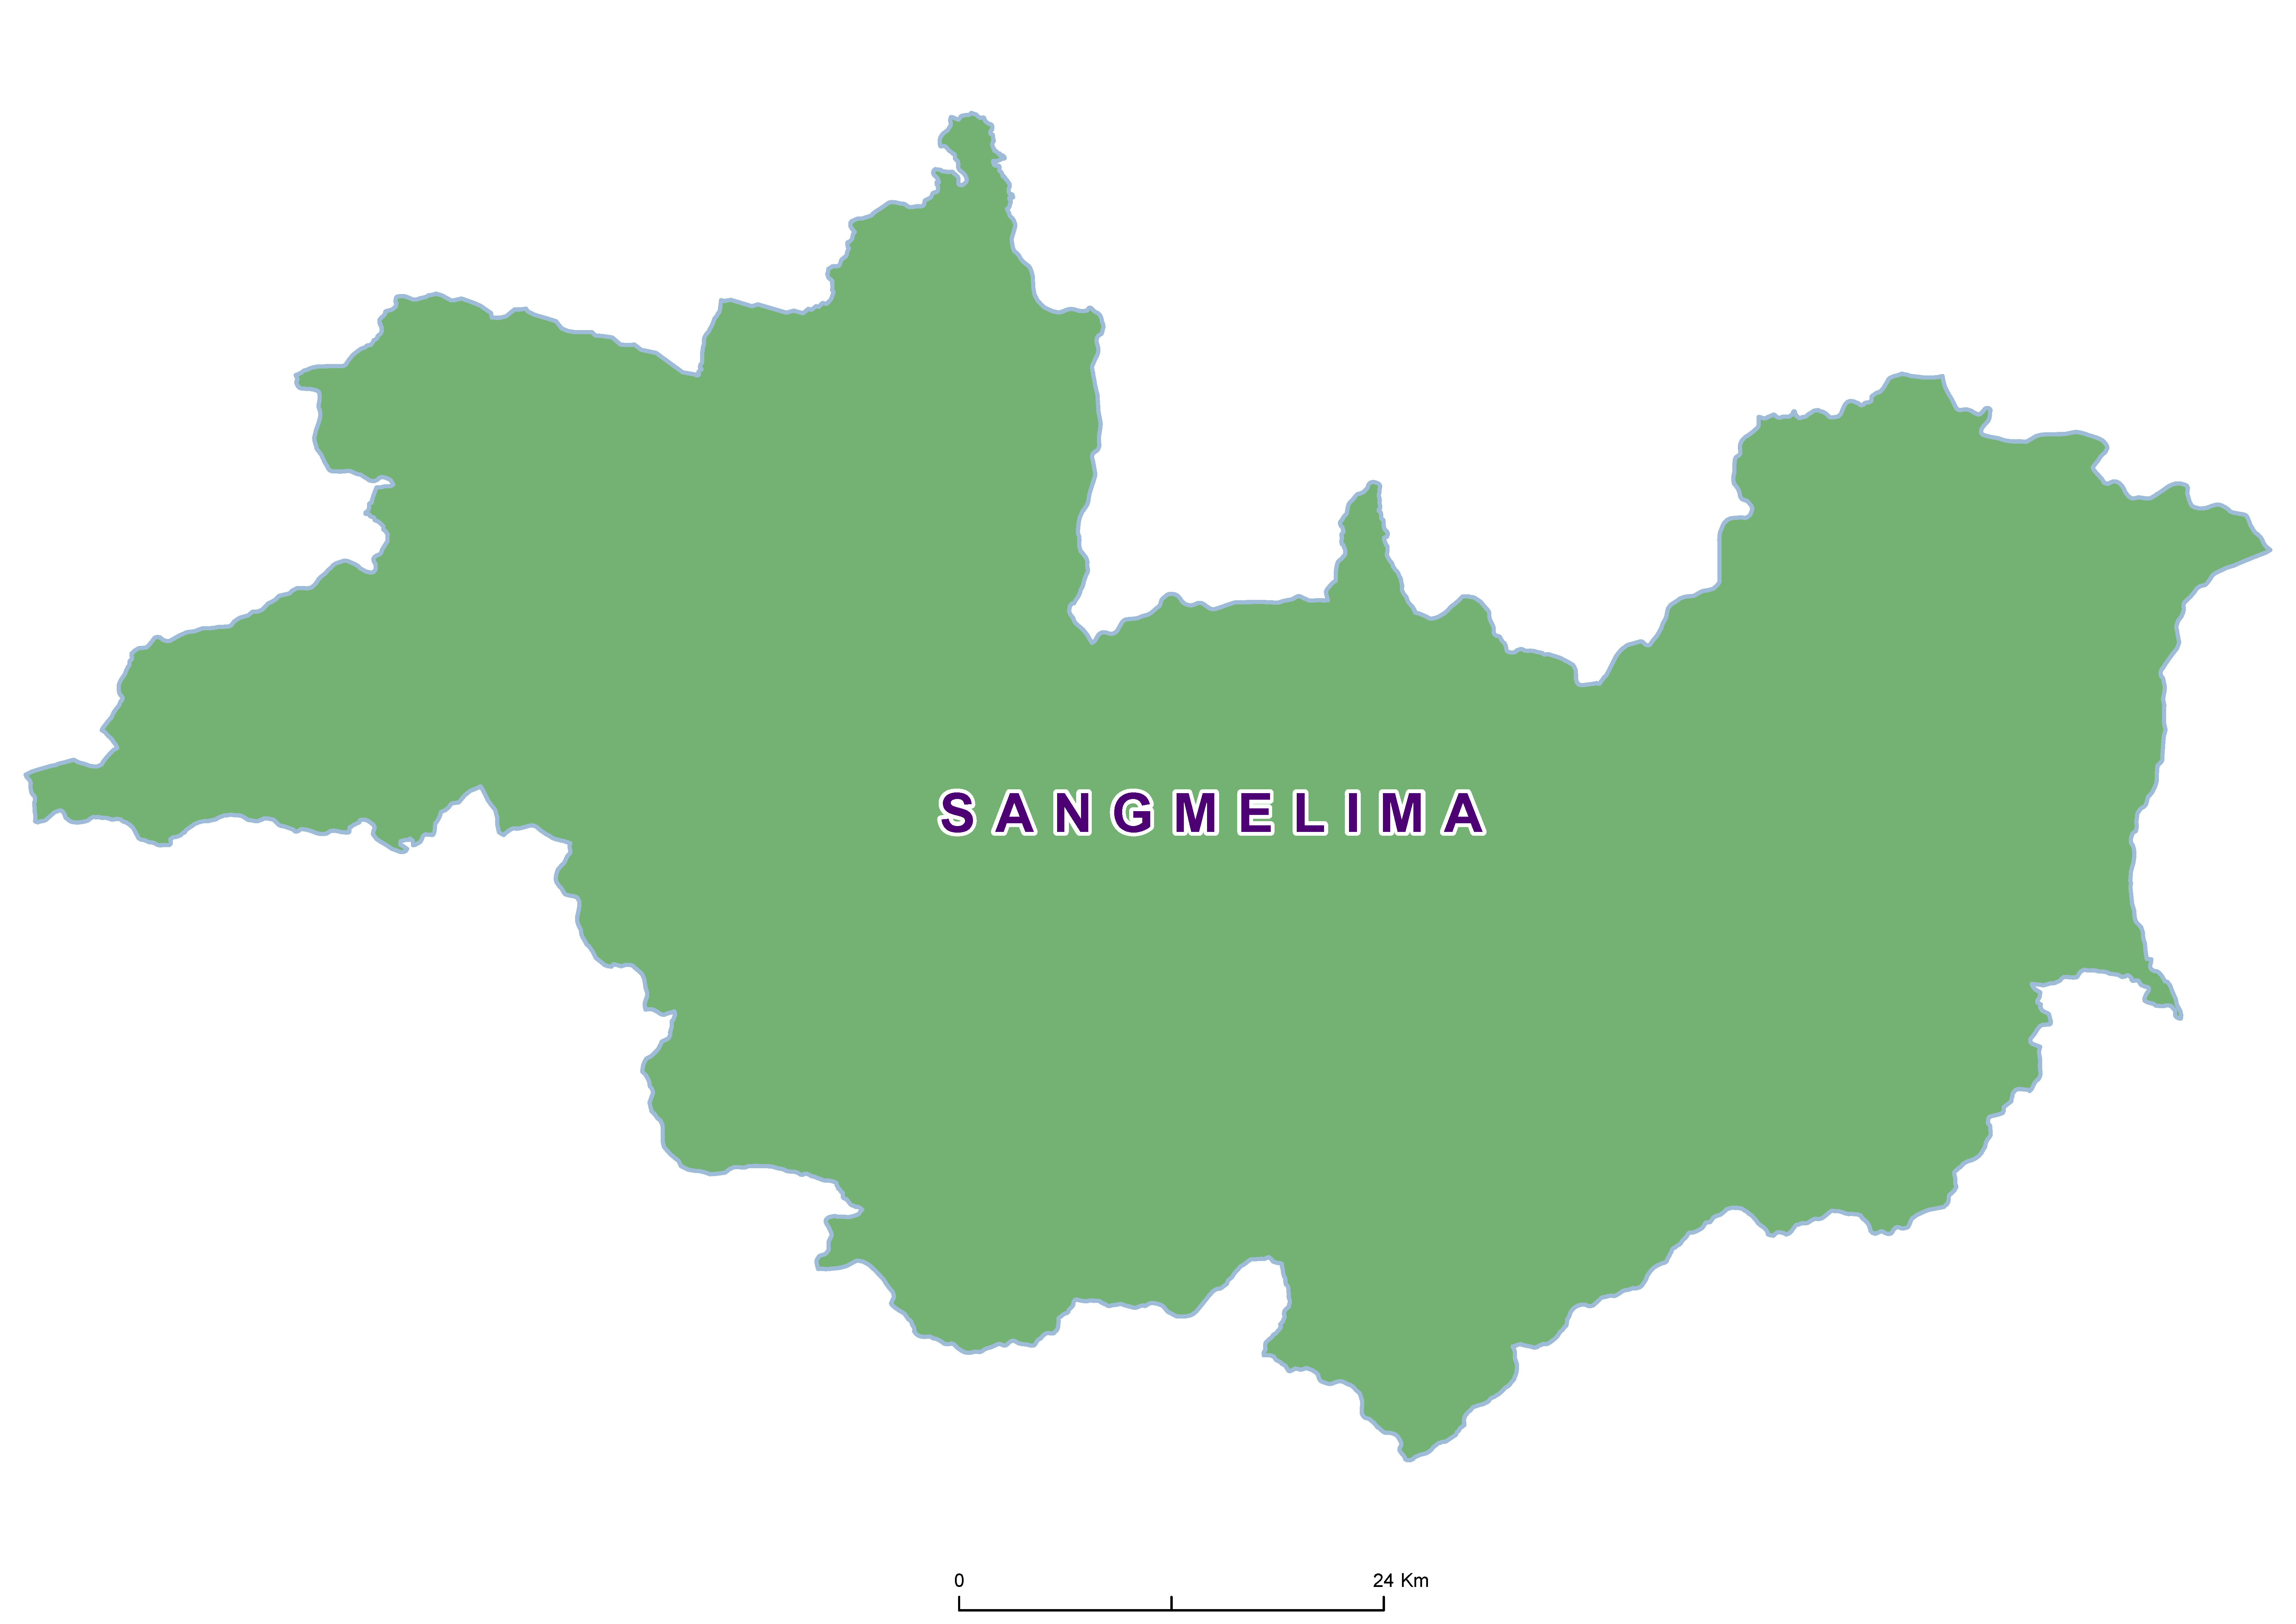 Sangmelima Mean SCH 20100001